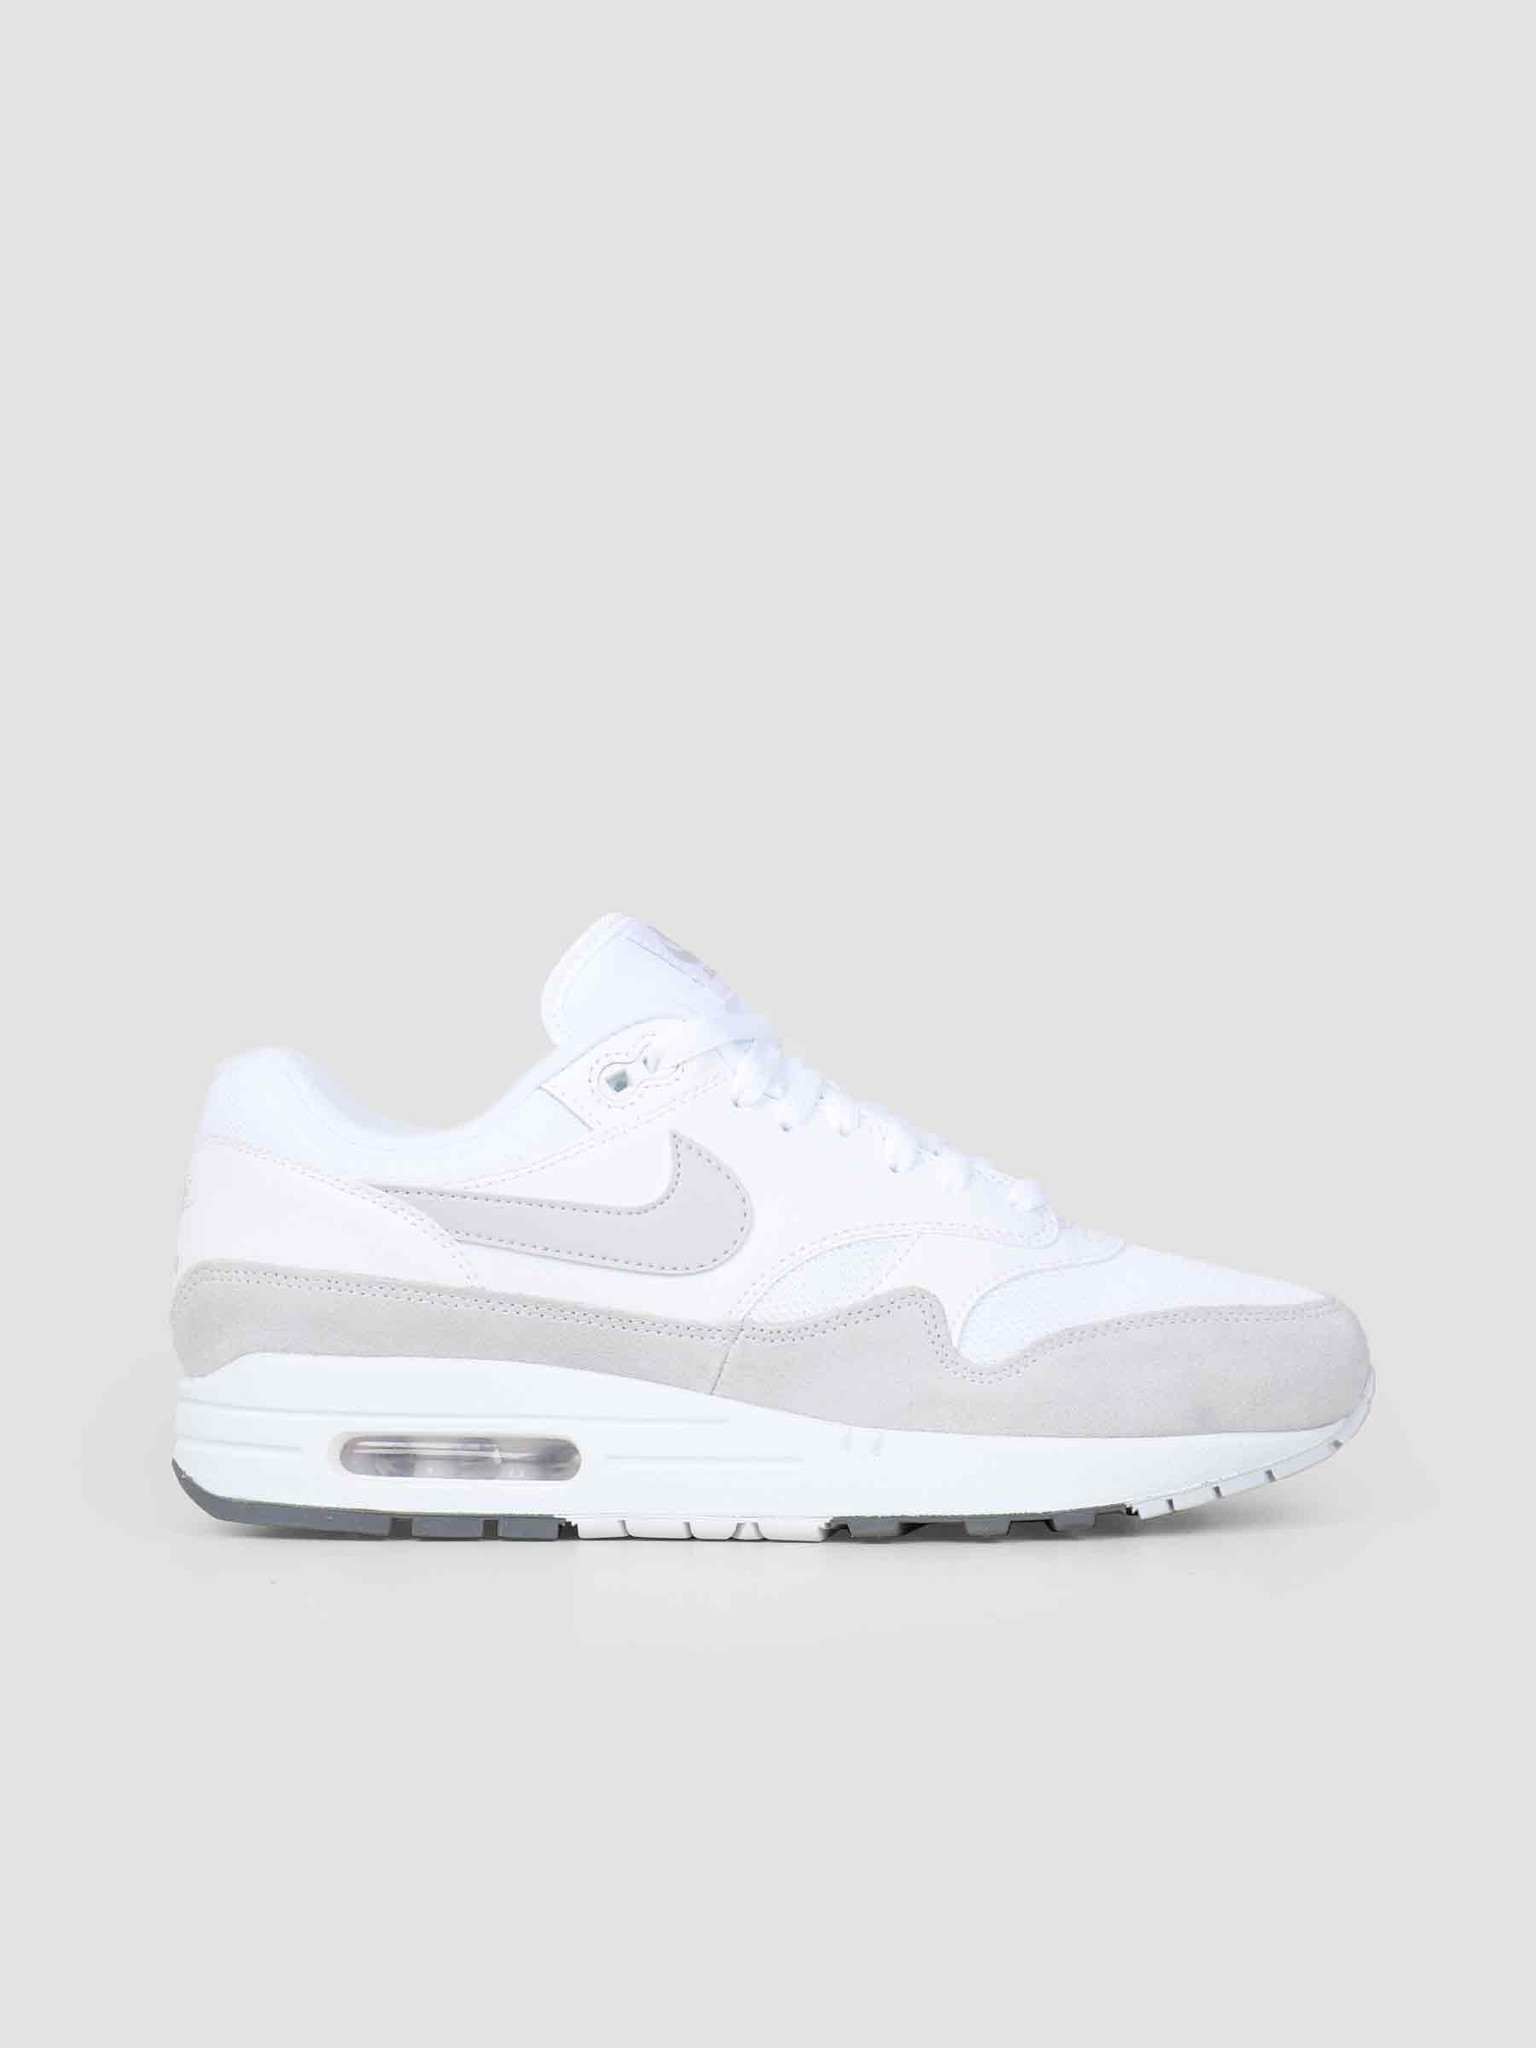 online retailer c304f 6eefc Nike Nike Air Max 1 Shoe White Pure Platinum Cool Grey AH8145-110